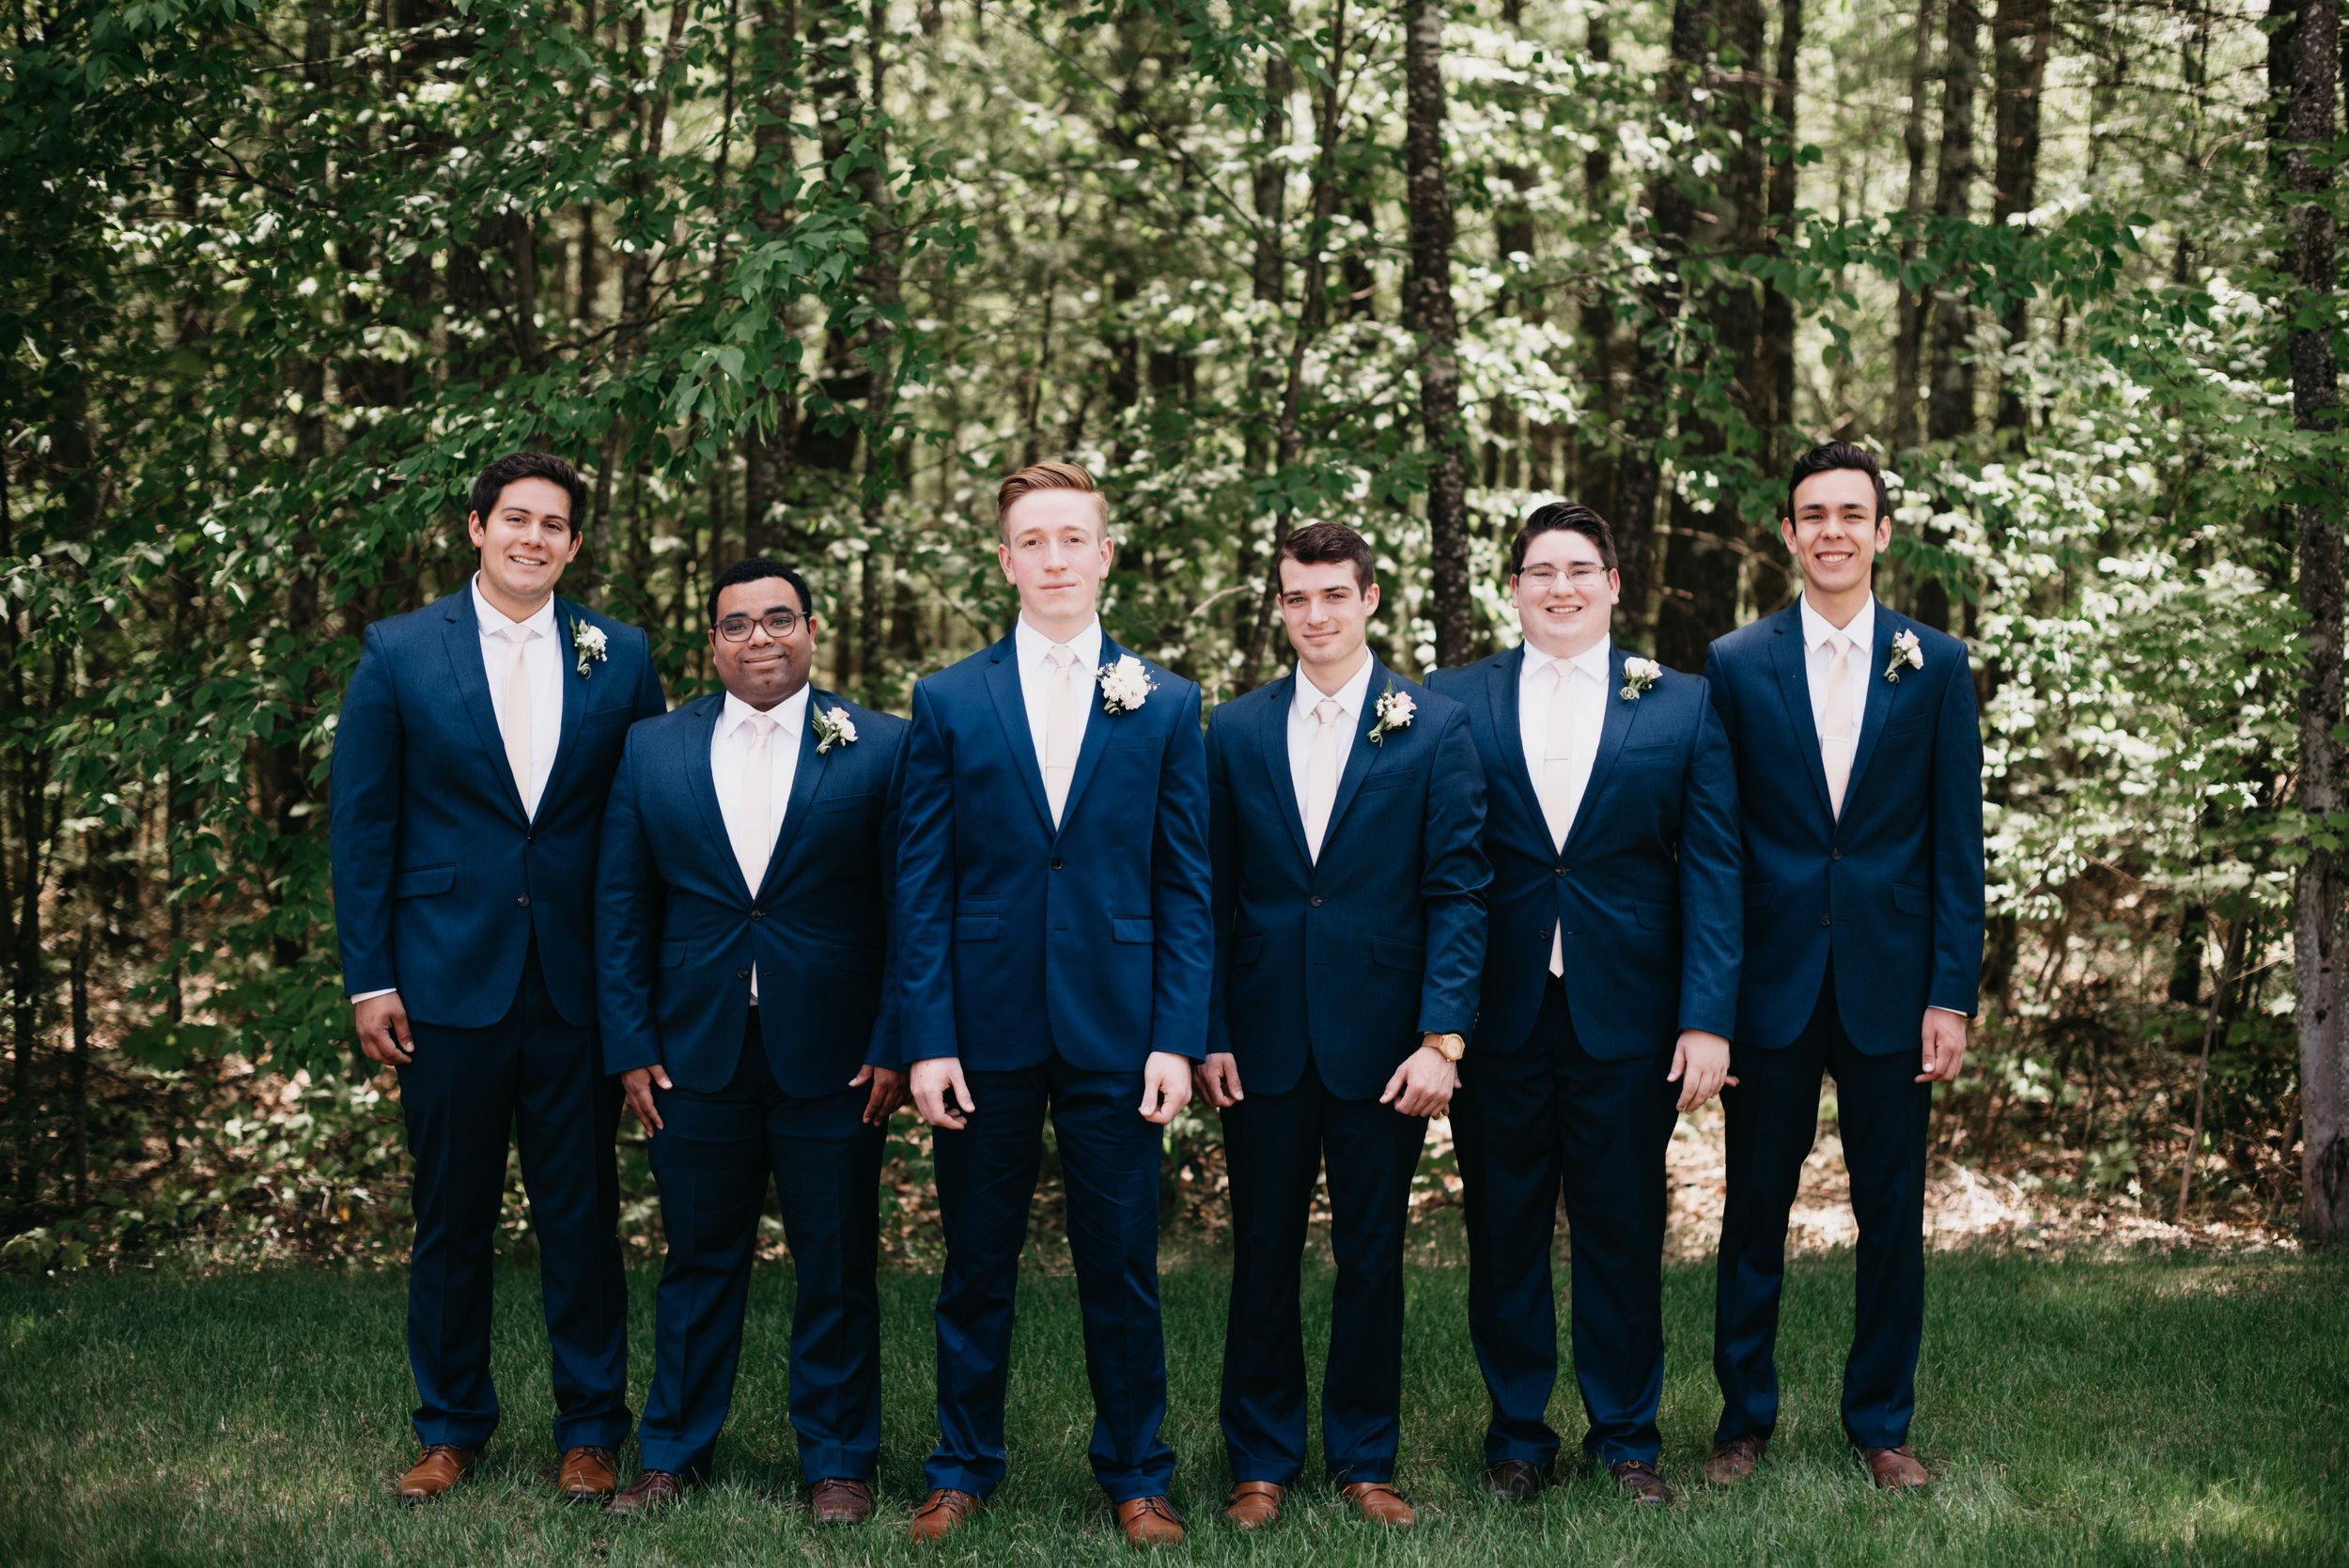 Barch-Massachusetts-Lakeside Tent Wedding-Western Massachusetts Wedding Photographer-00663.jpg